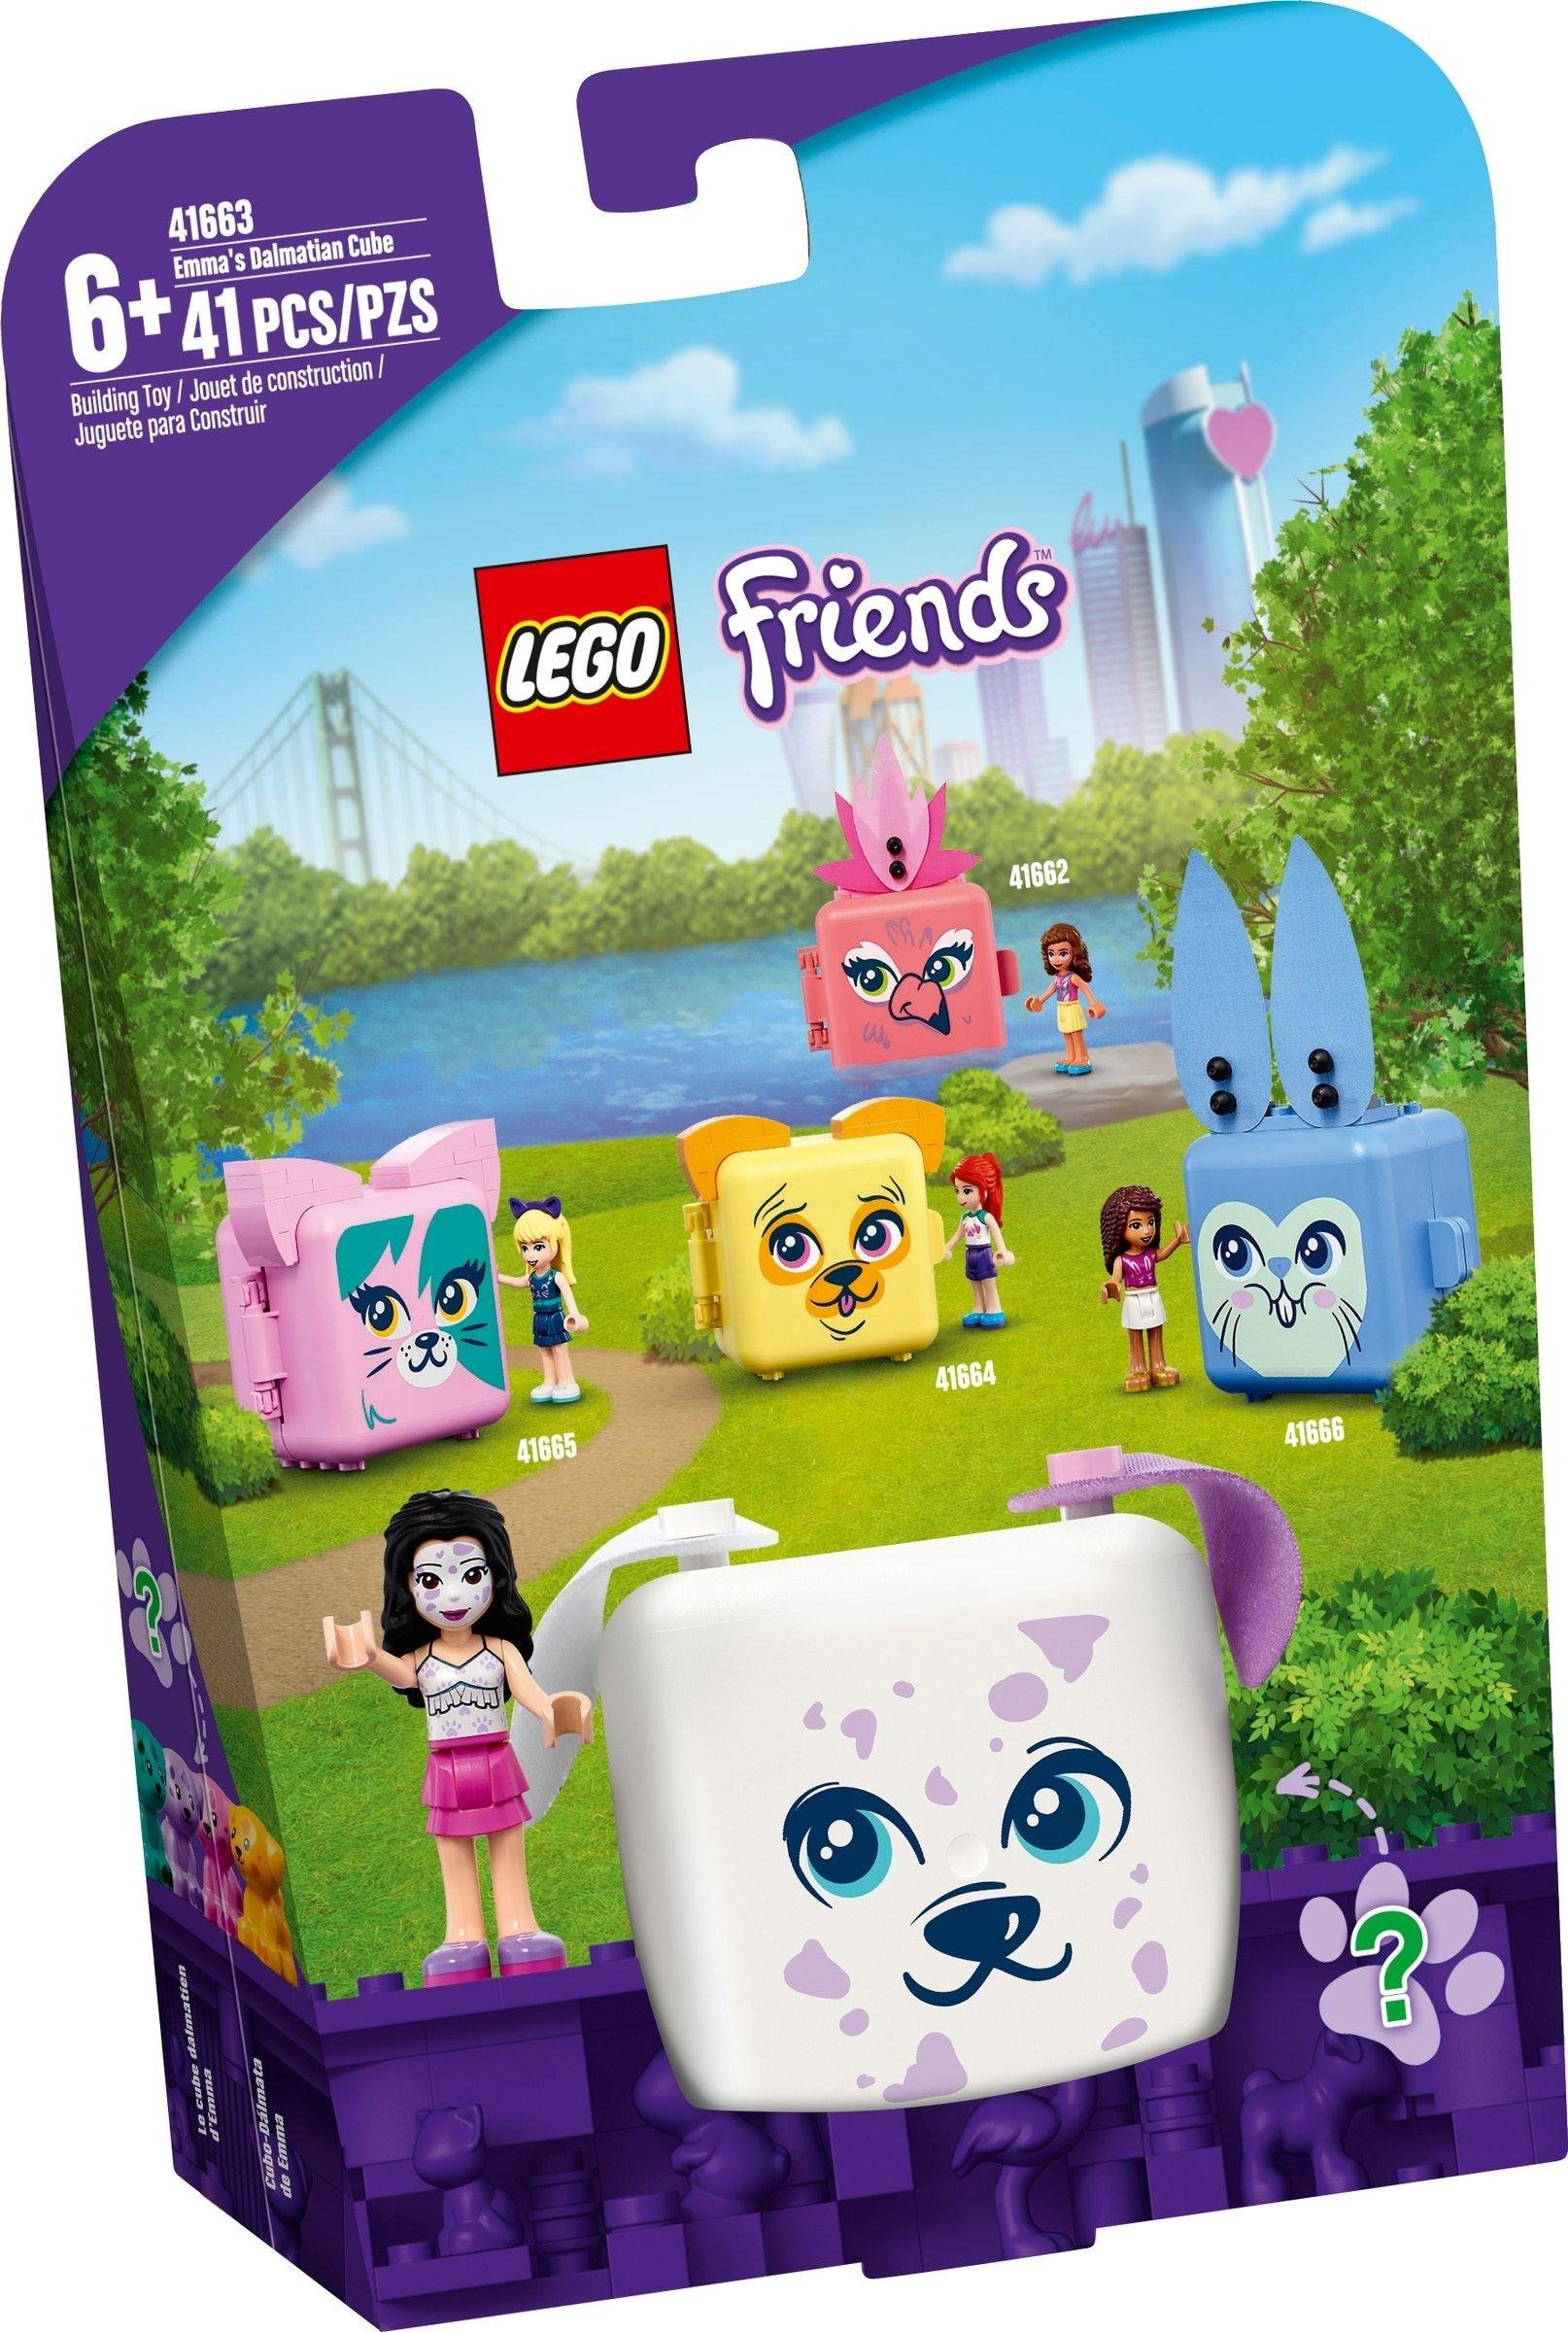 LEGO Friends - Emma's Dalmatian Cube (41663)